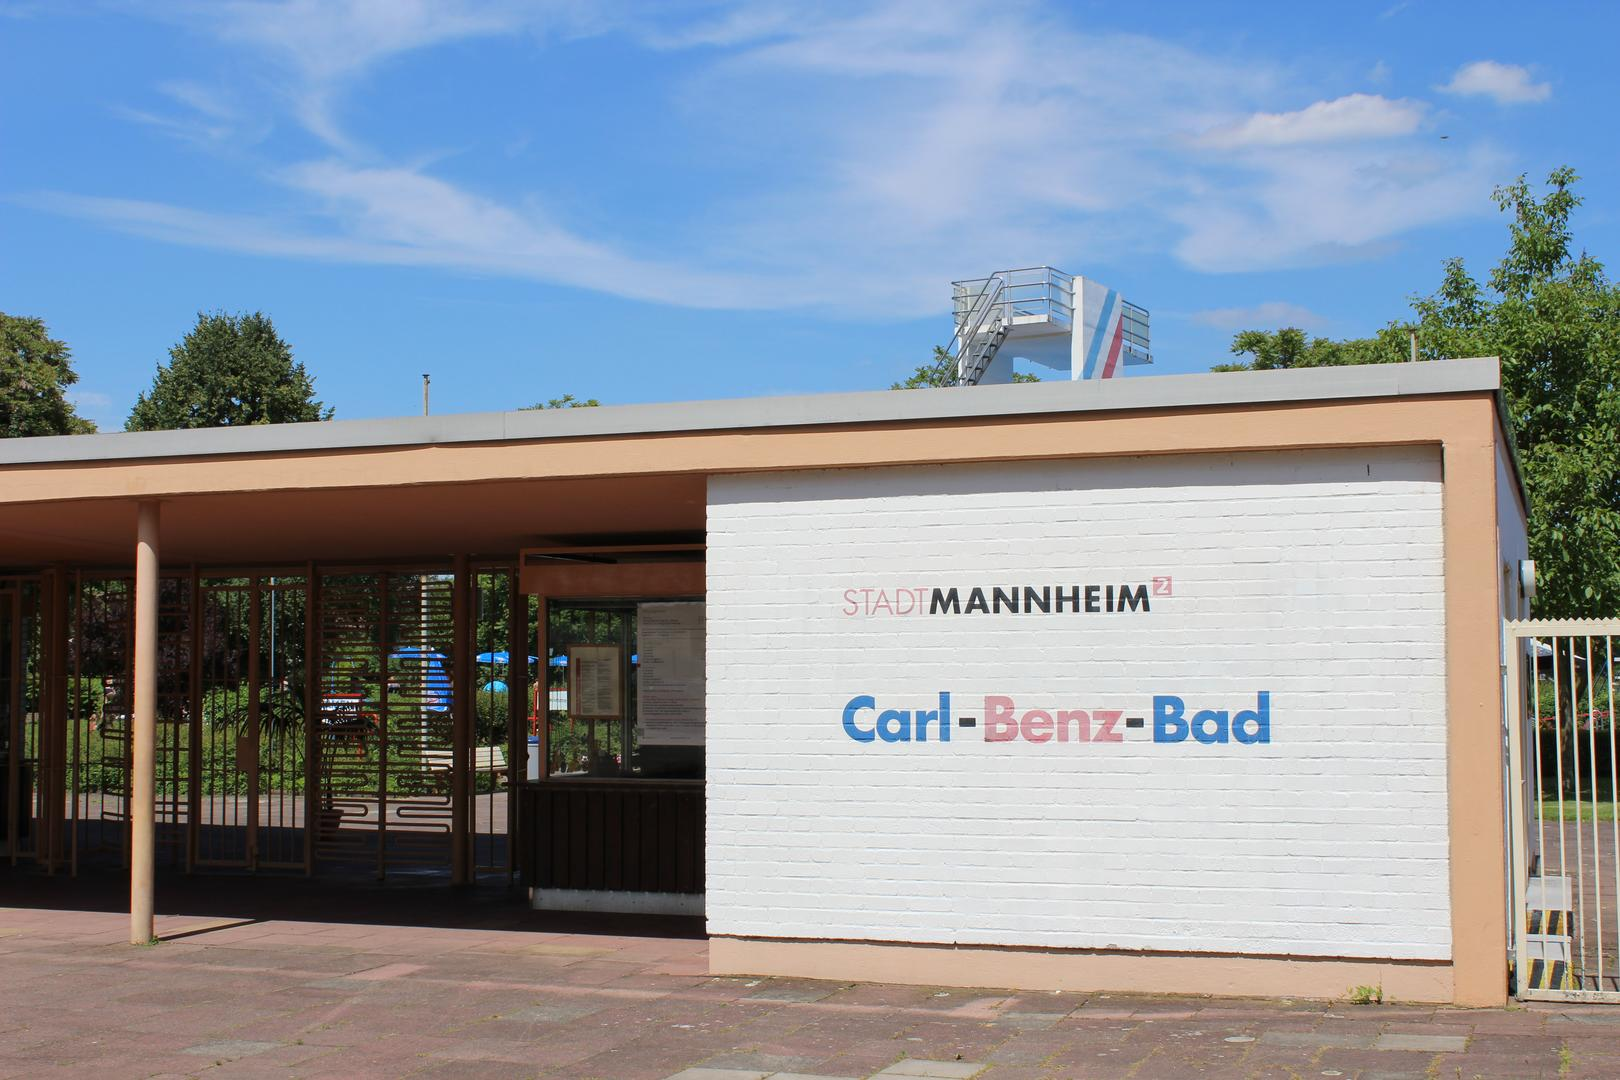 Carl-Benz-Bad | Mannheim.de